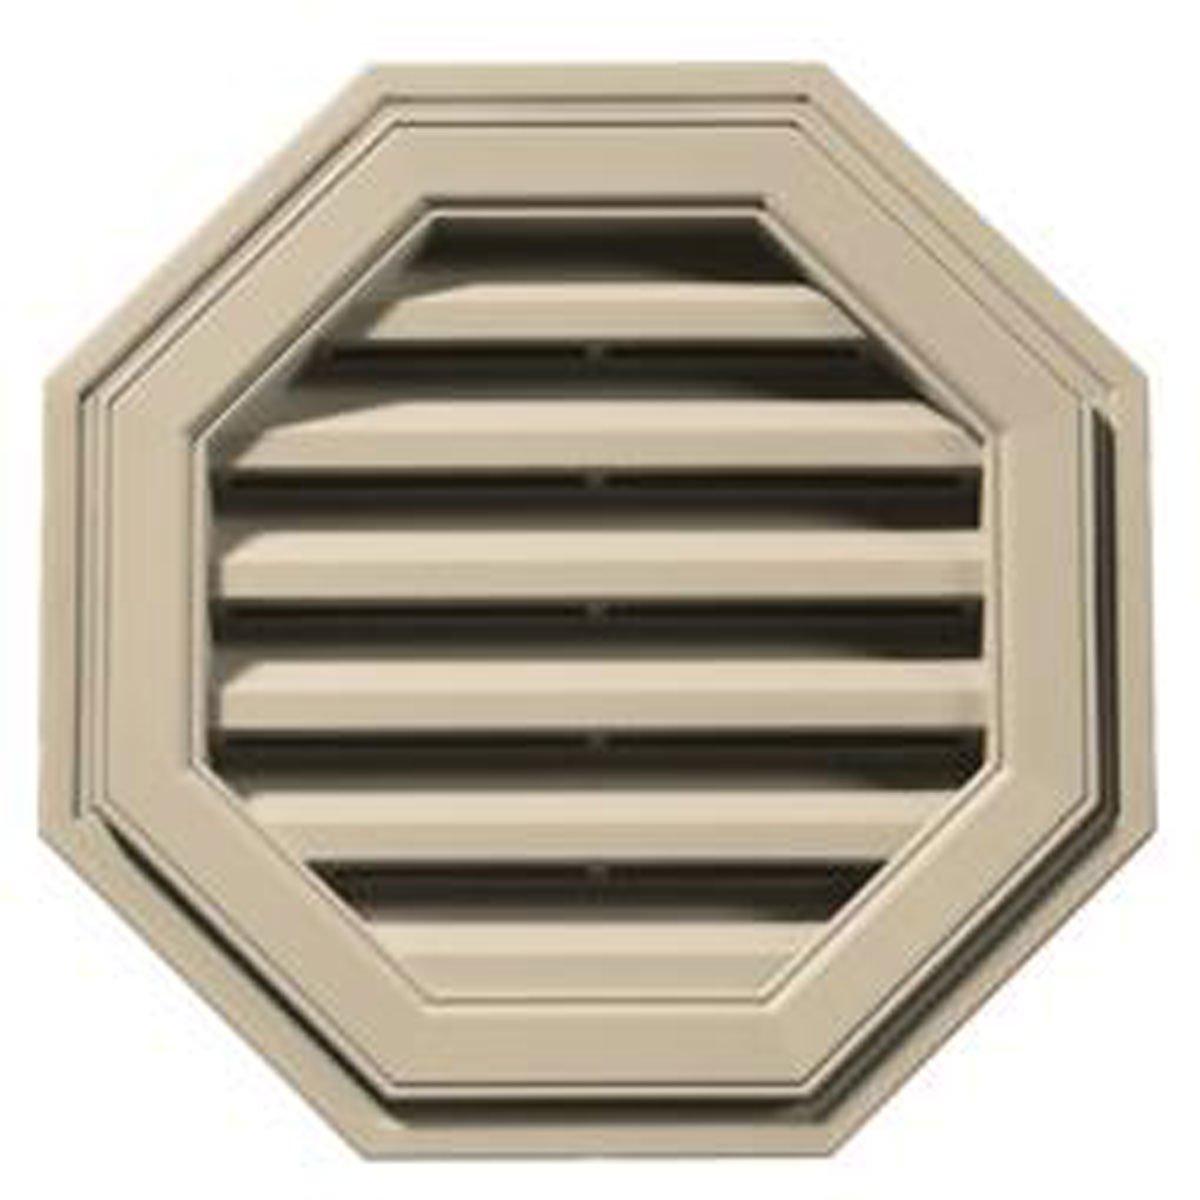 18'' W x 18'' H Octagon Gable Vent Louver, 26 Sq. Inch Vent Area, 011 - Sandalwood